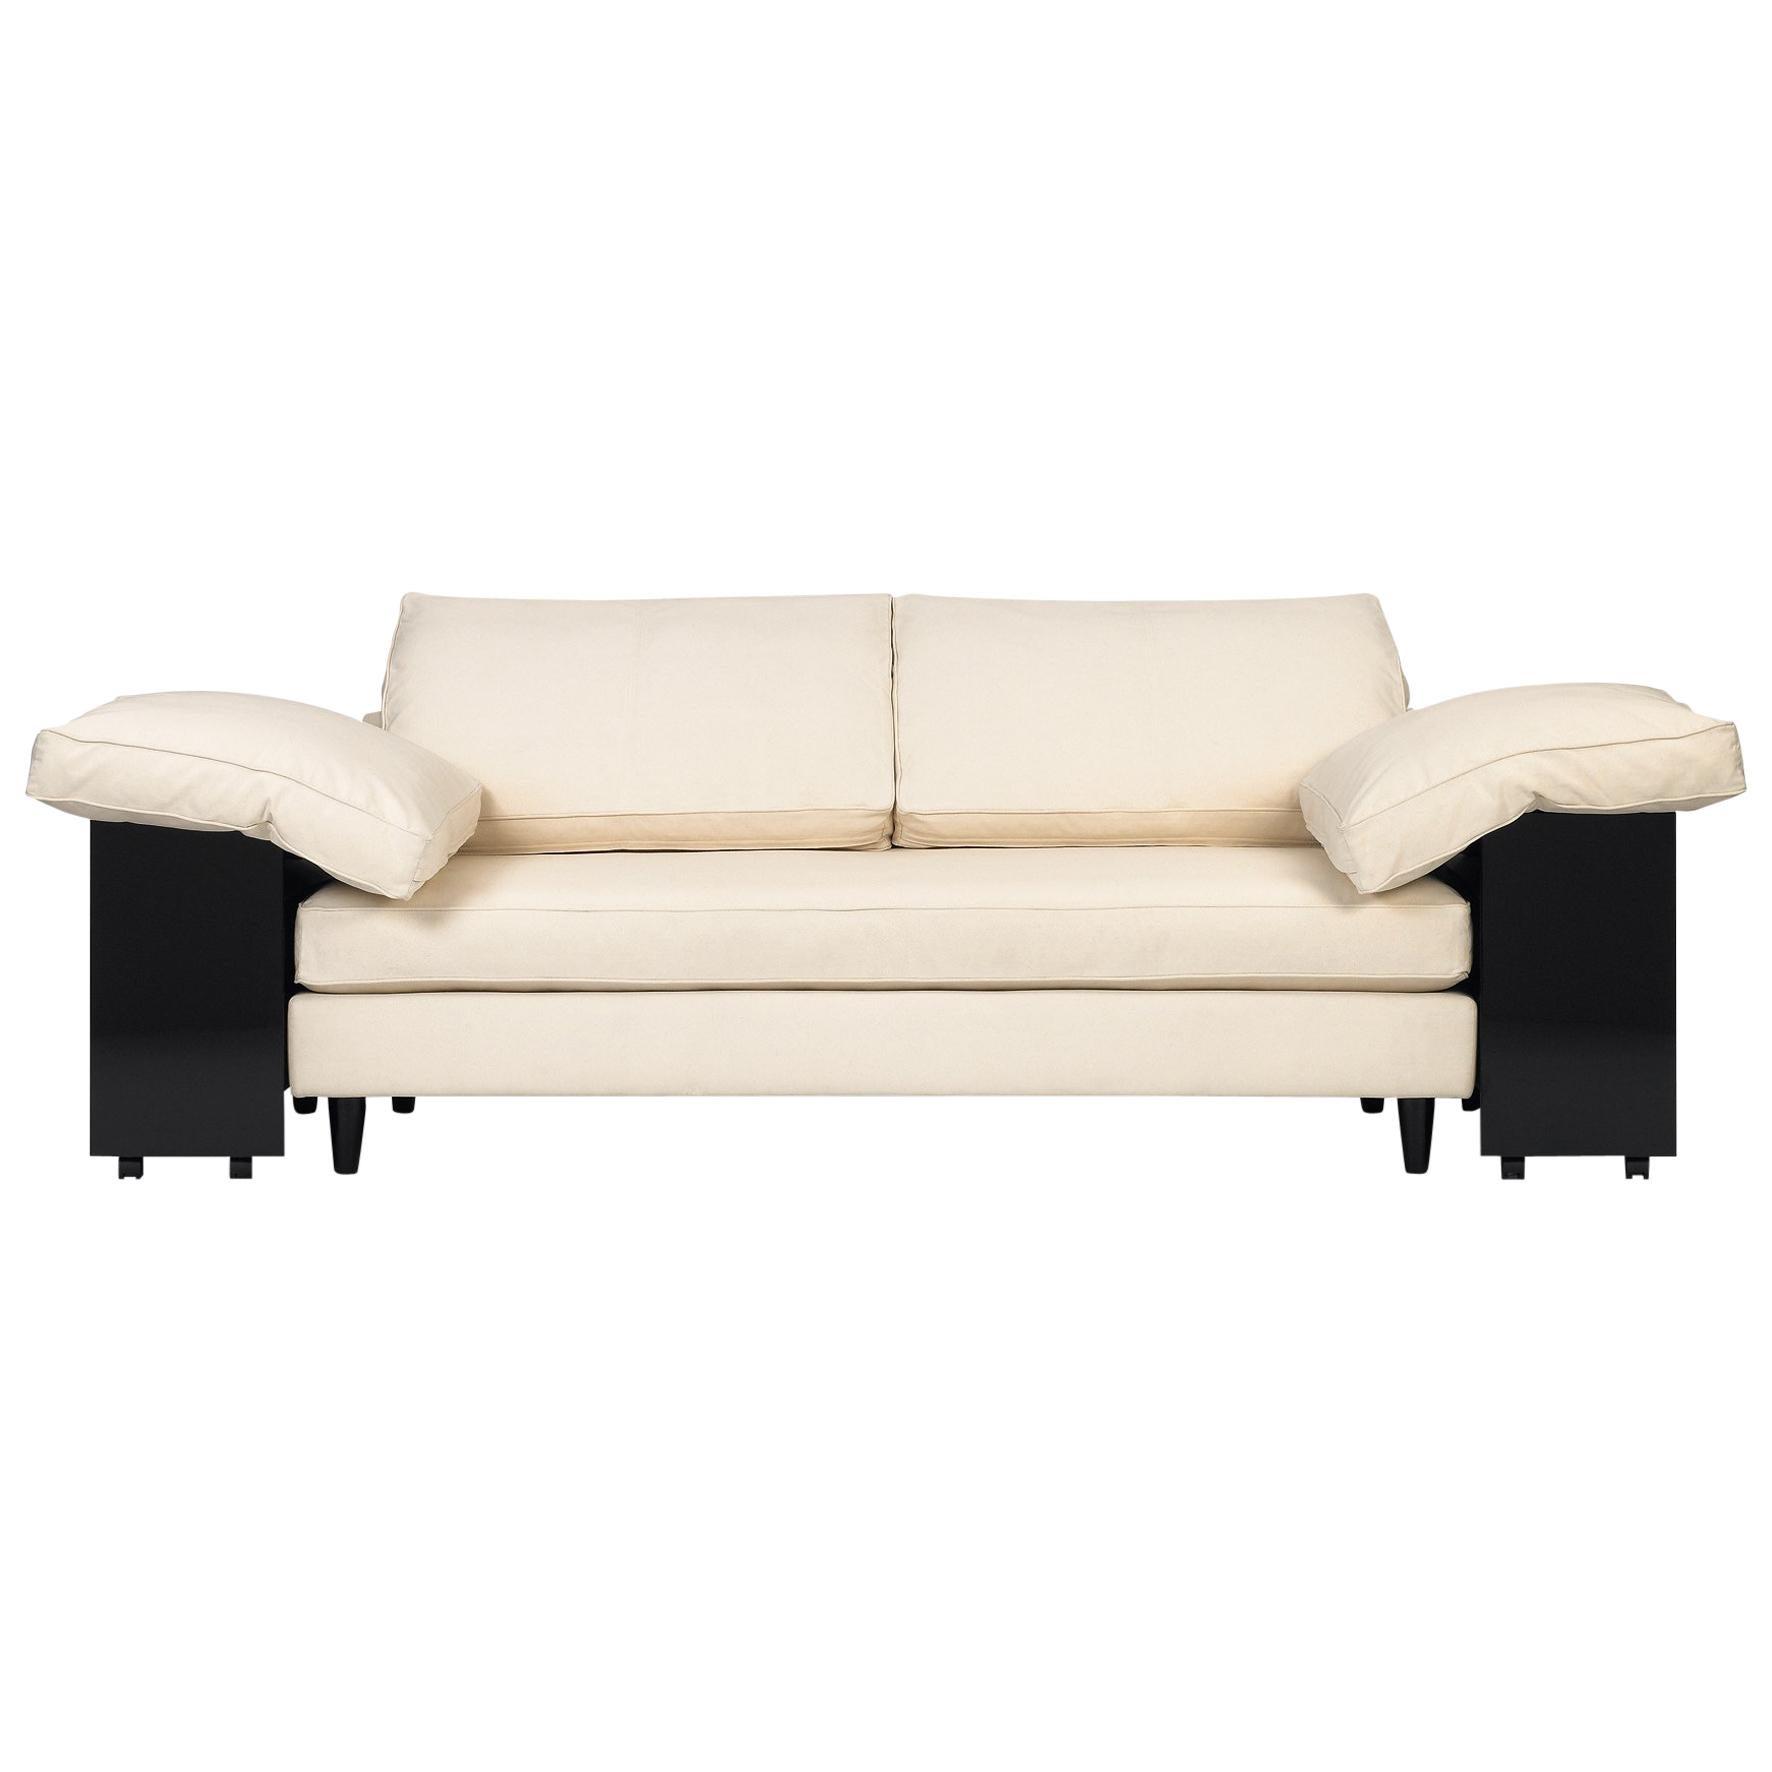 ClassiCon Lota Sofa by Eileen Gray